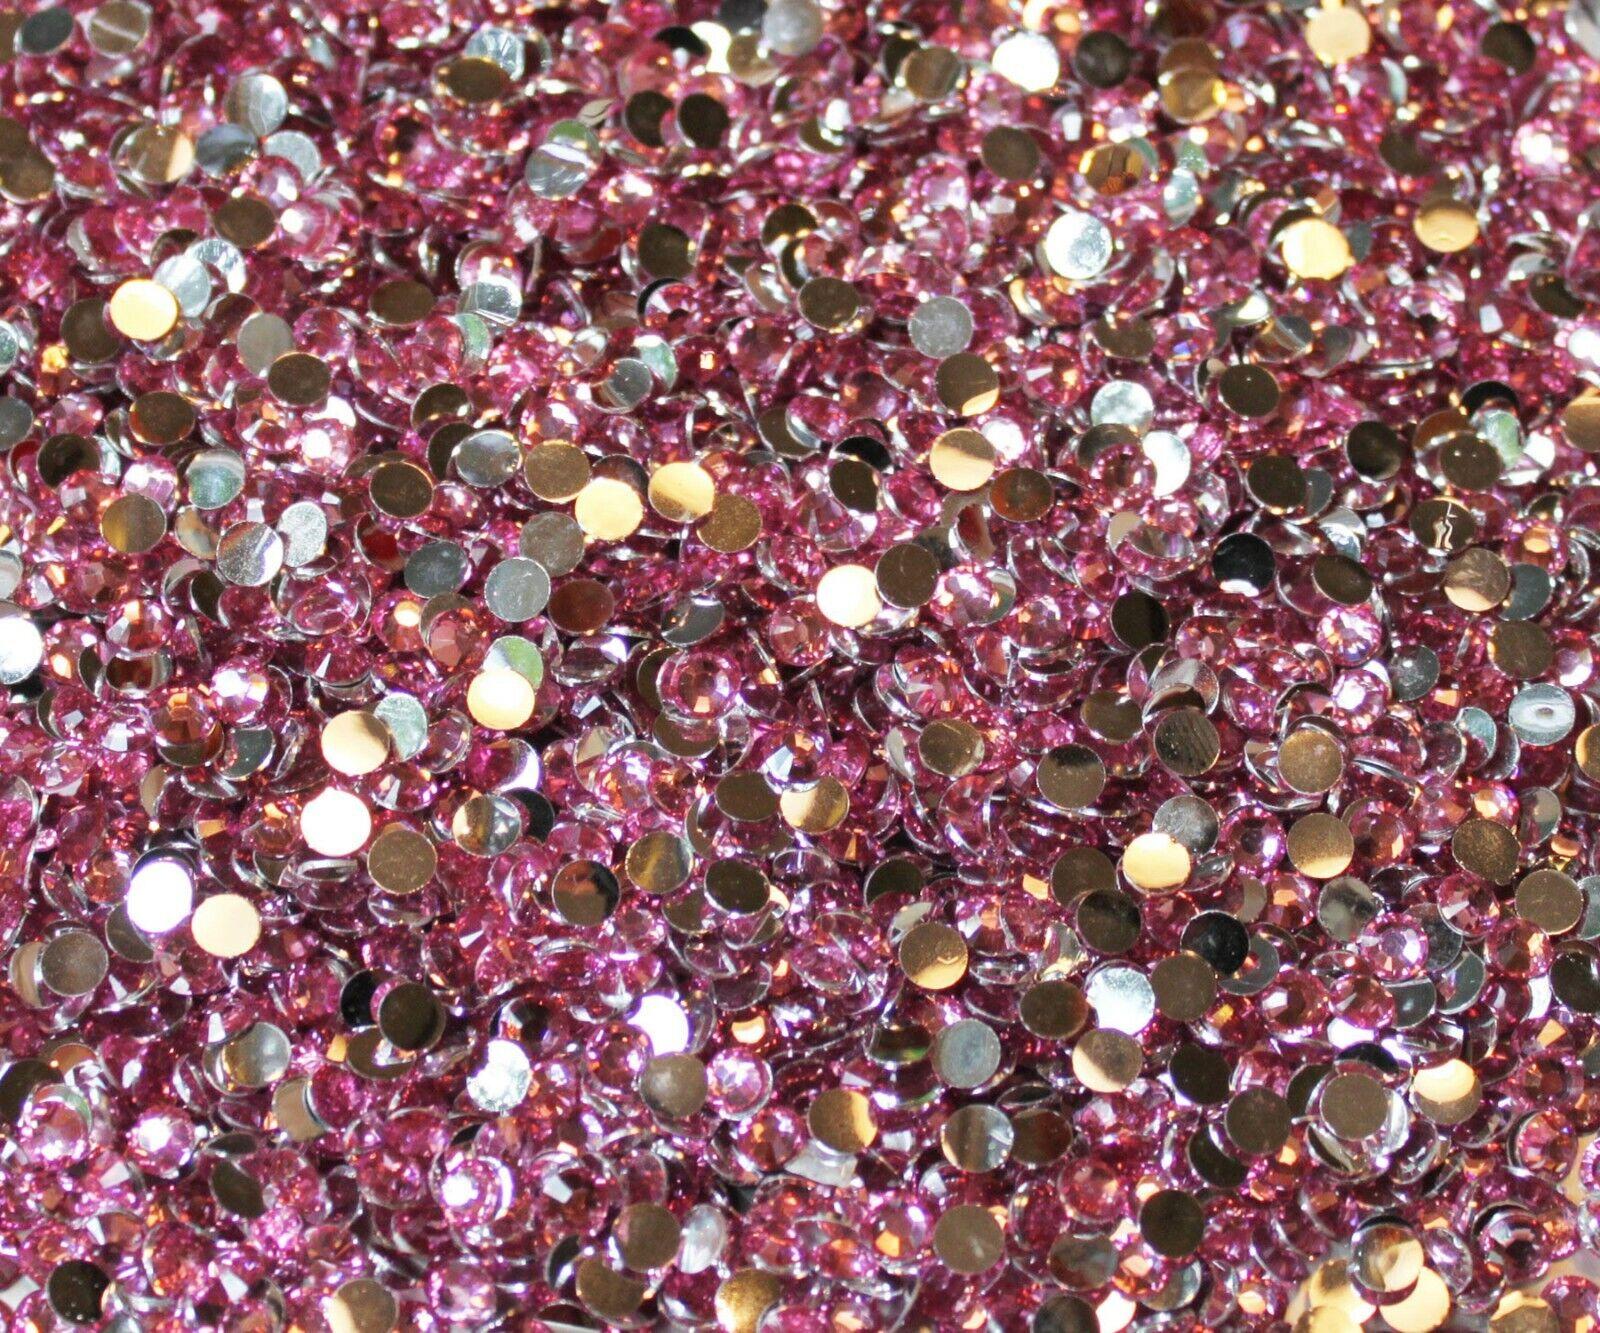 1000 Crystal Flat Back Resin Rhinestones Gems 60 colors, 2mm, 3mm, 4mm, 5mm, 6.5 PINK